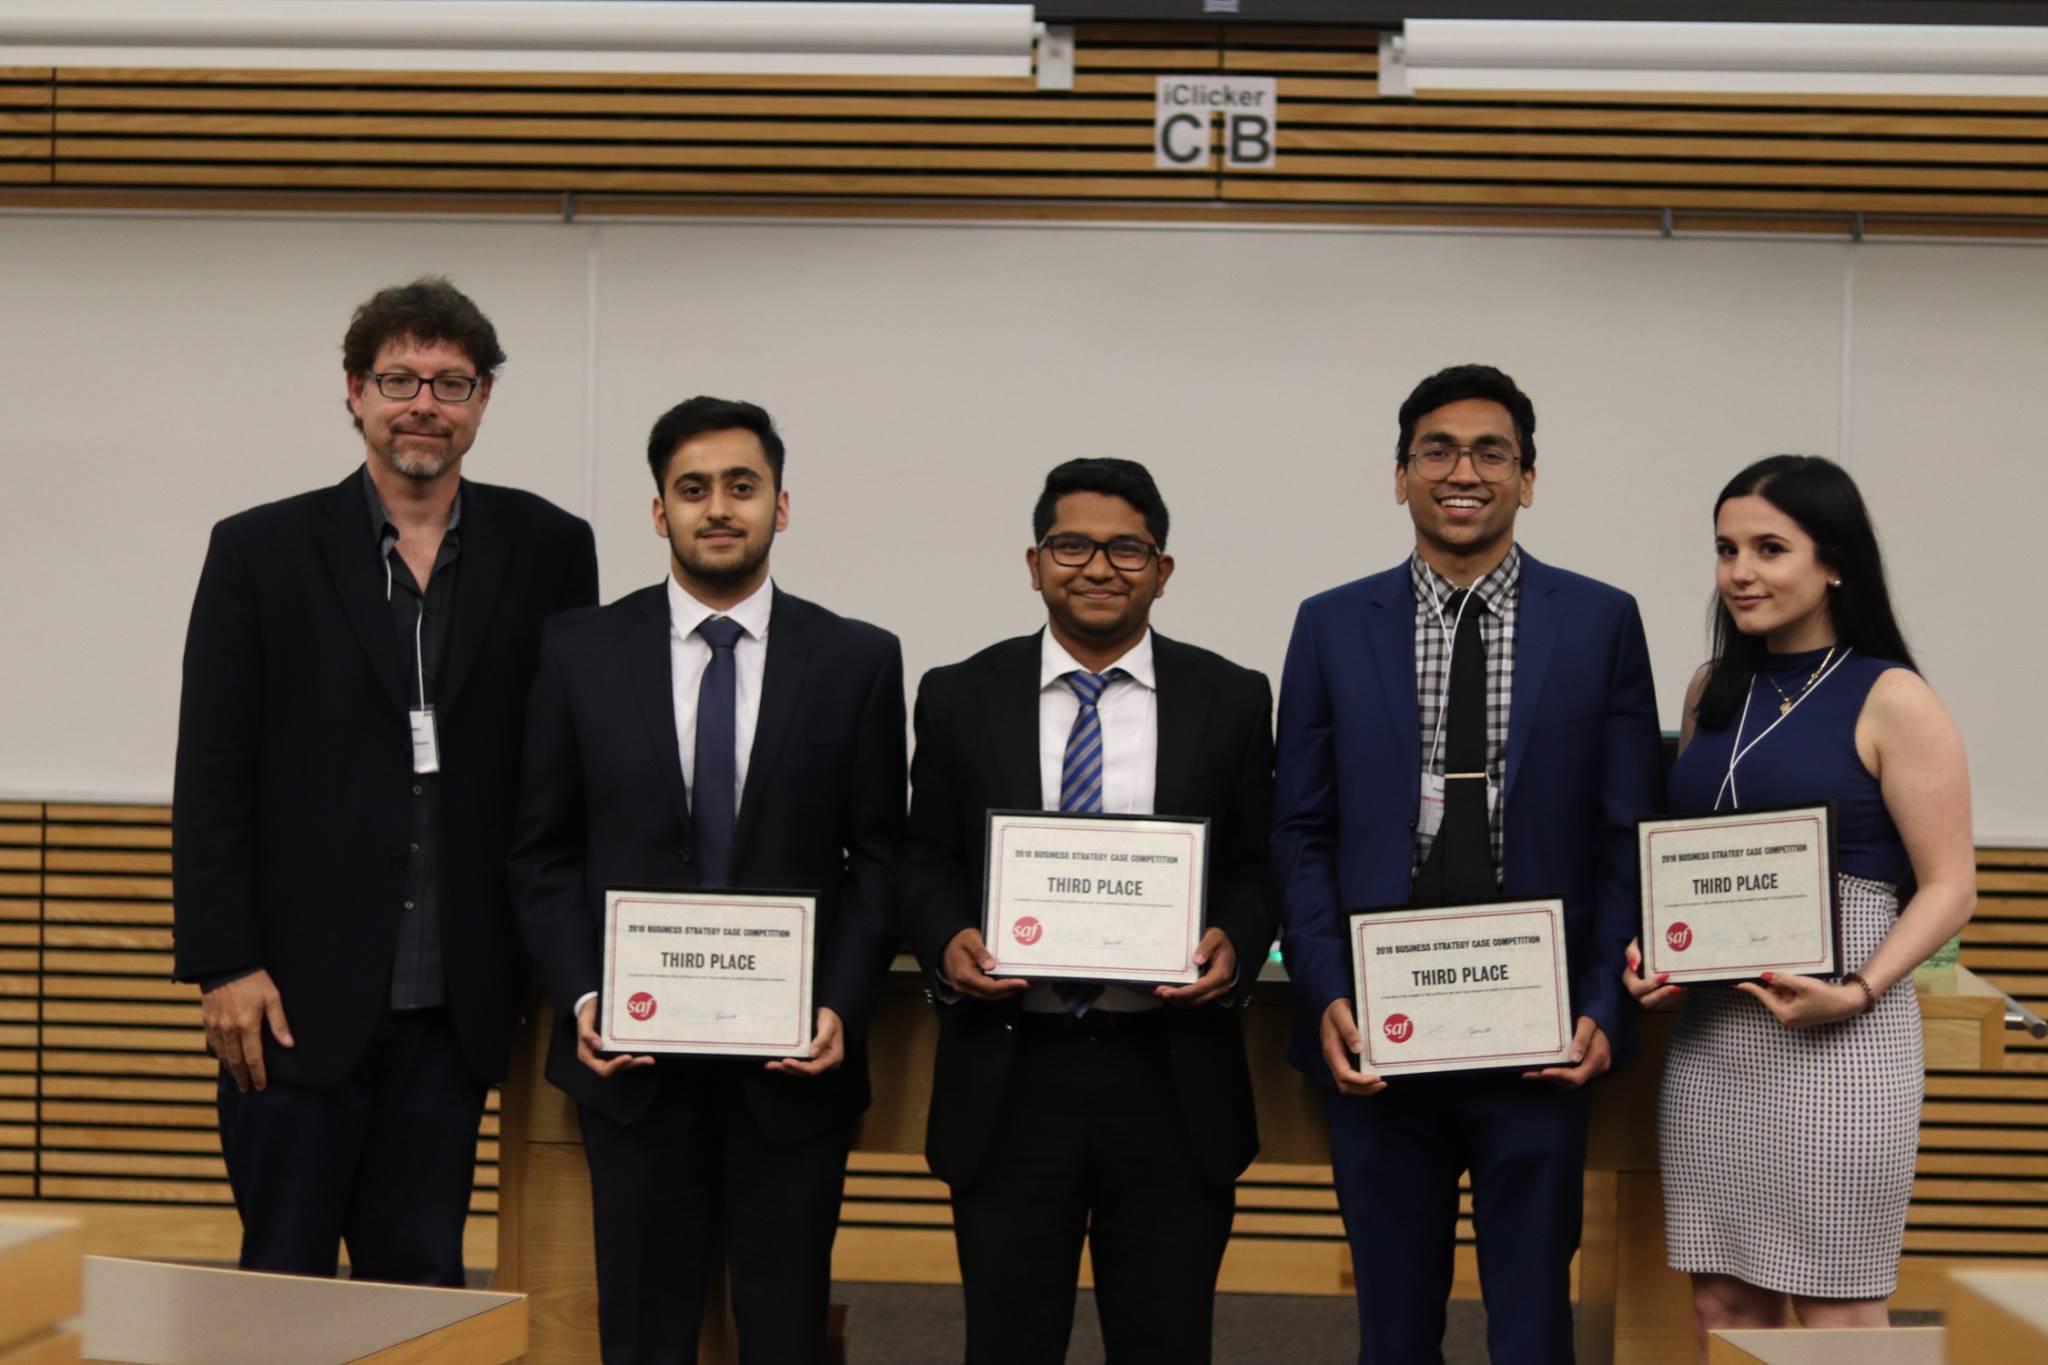 Mark Arnason, Faculty mentor, Abishek Jain, Shobith Raju, Haseen Selim, Esmat Bacha